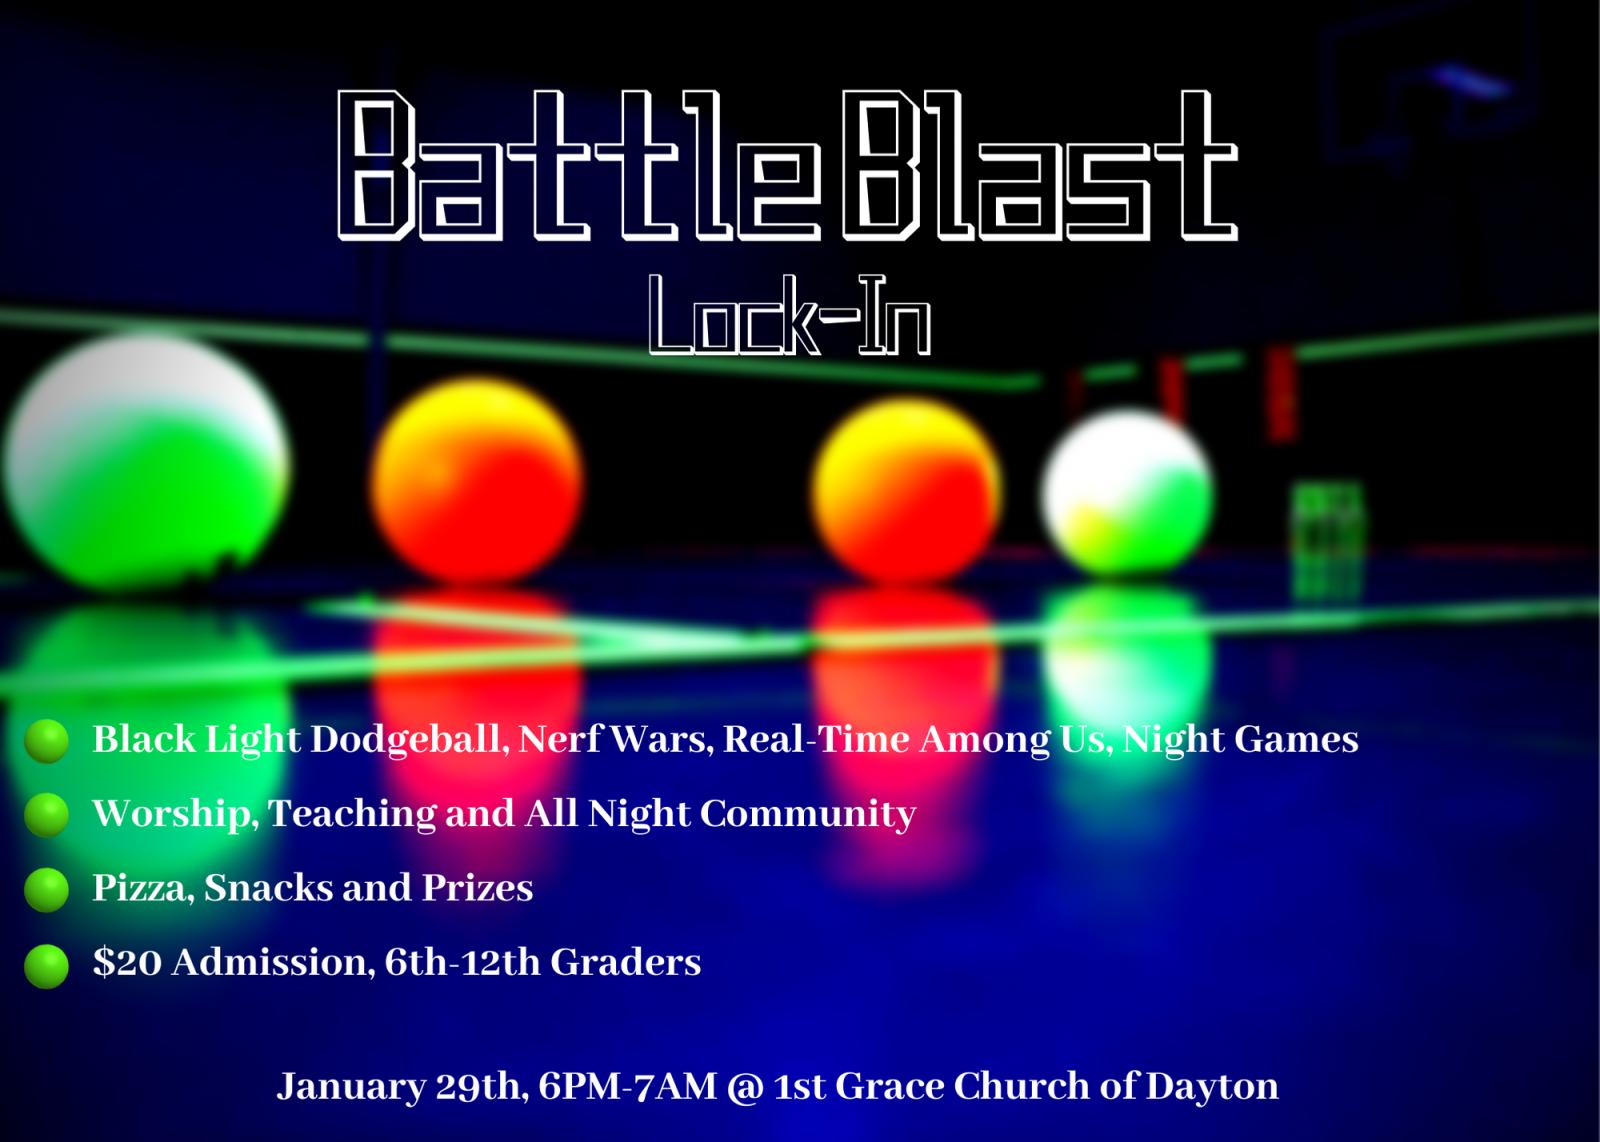 Battle Blast